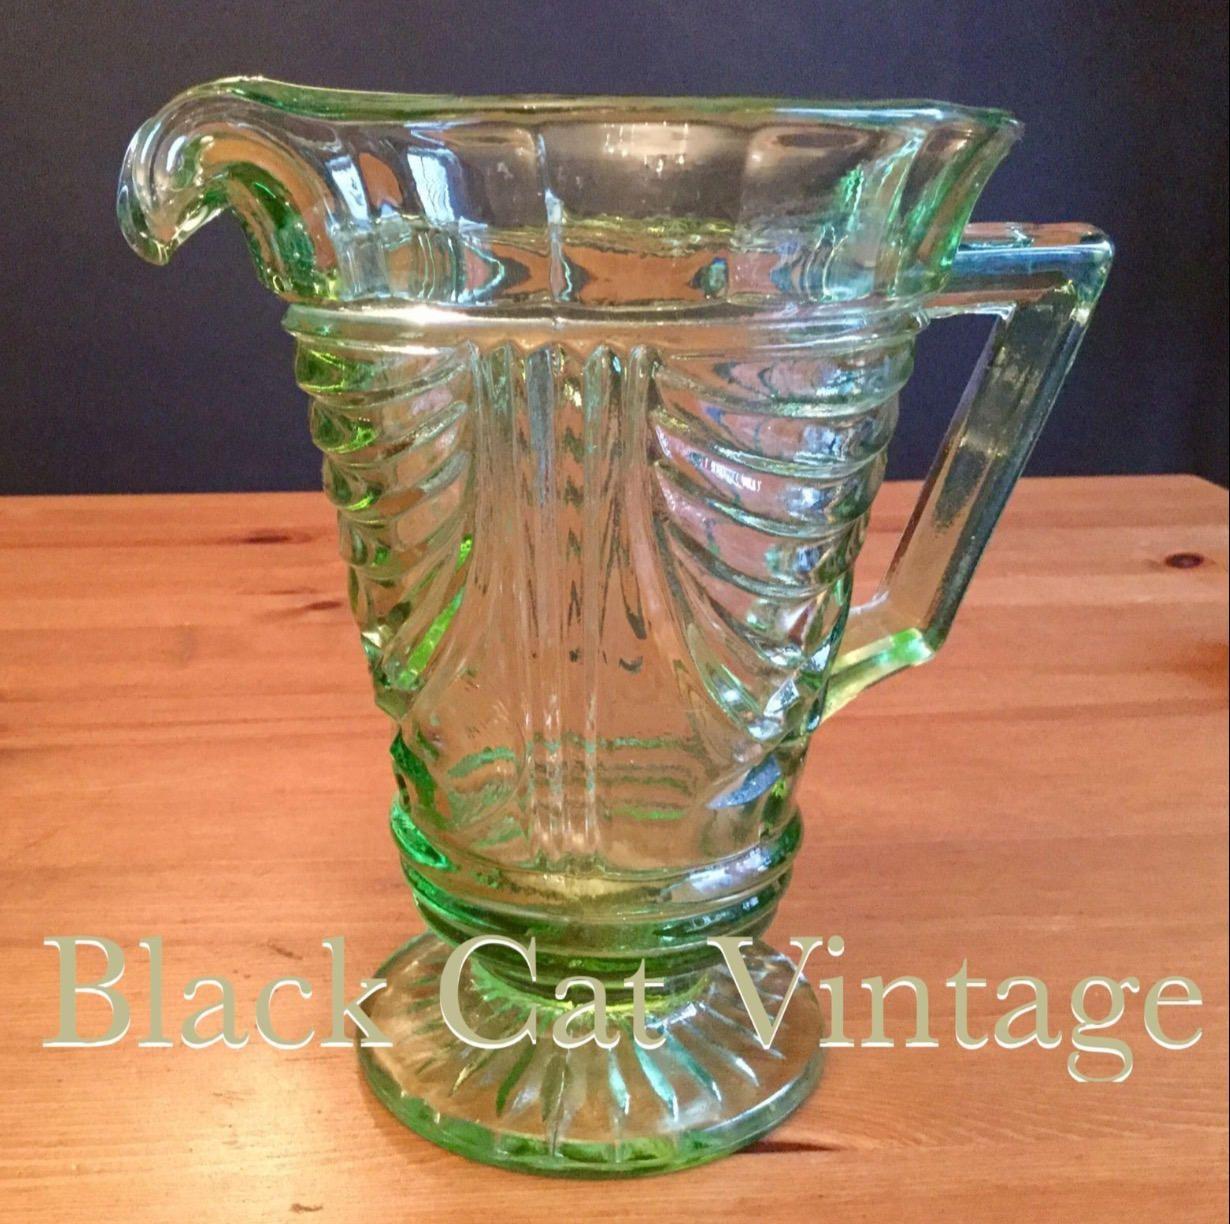 1930s sowerby pressed green glass water jug pitcher vase vintage 1930s sowerby pressed green glass water jug pitcher vase vintage retro art deco patt no 5220 reviewsmspy